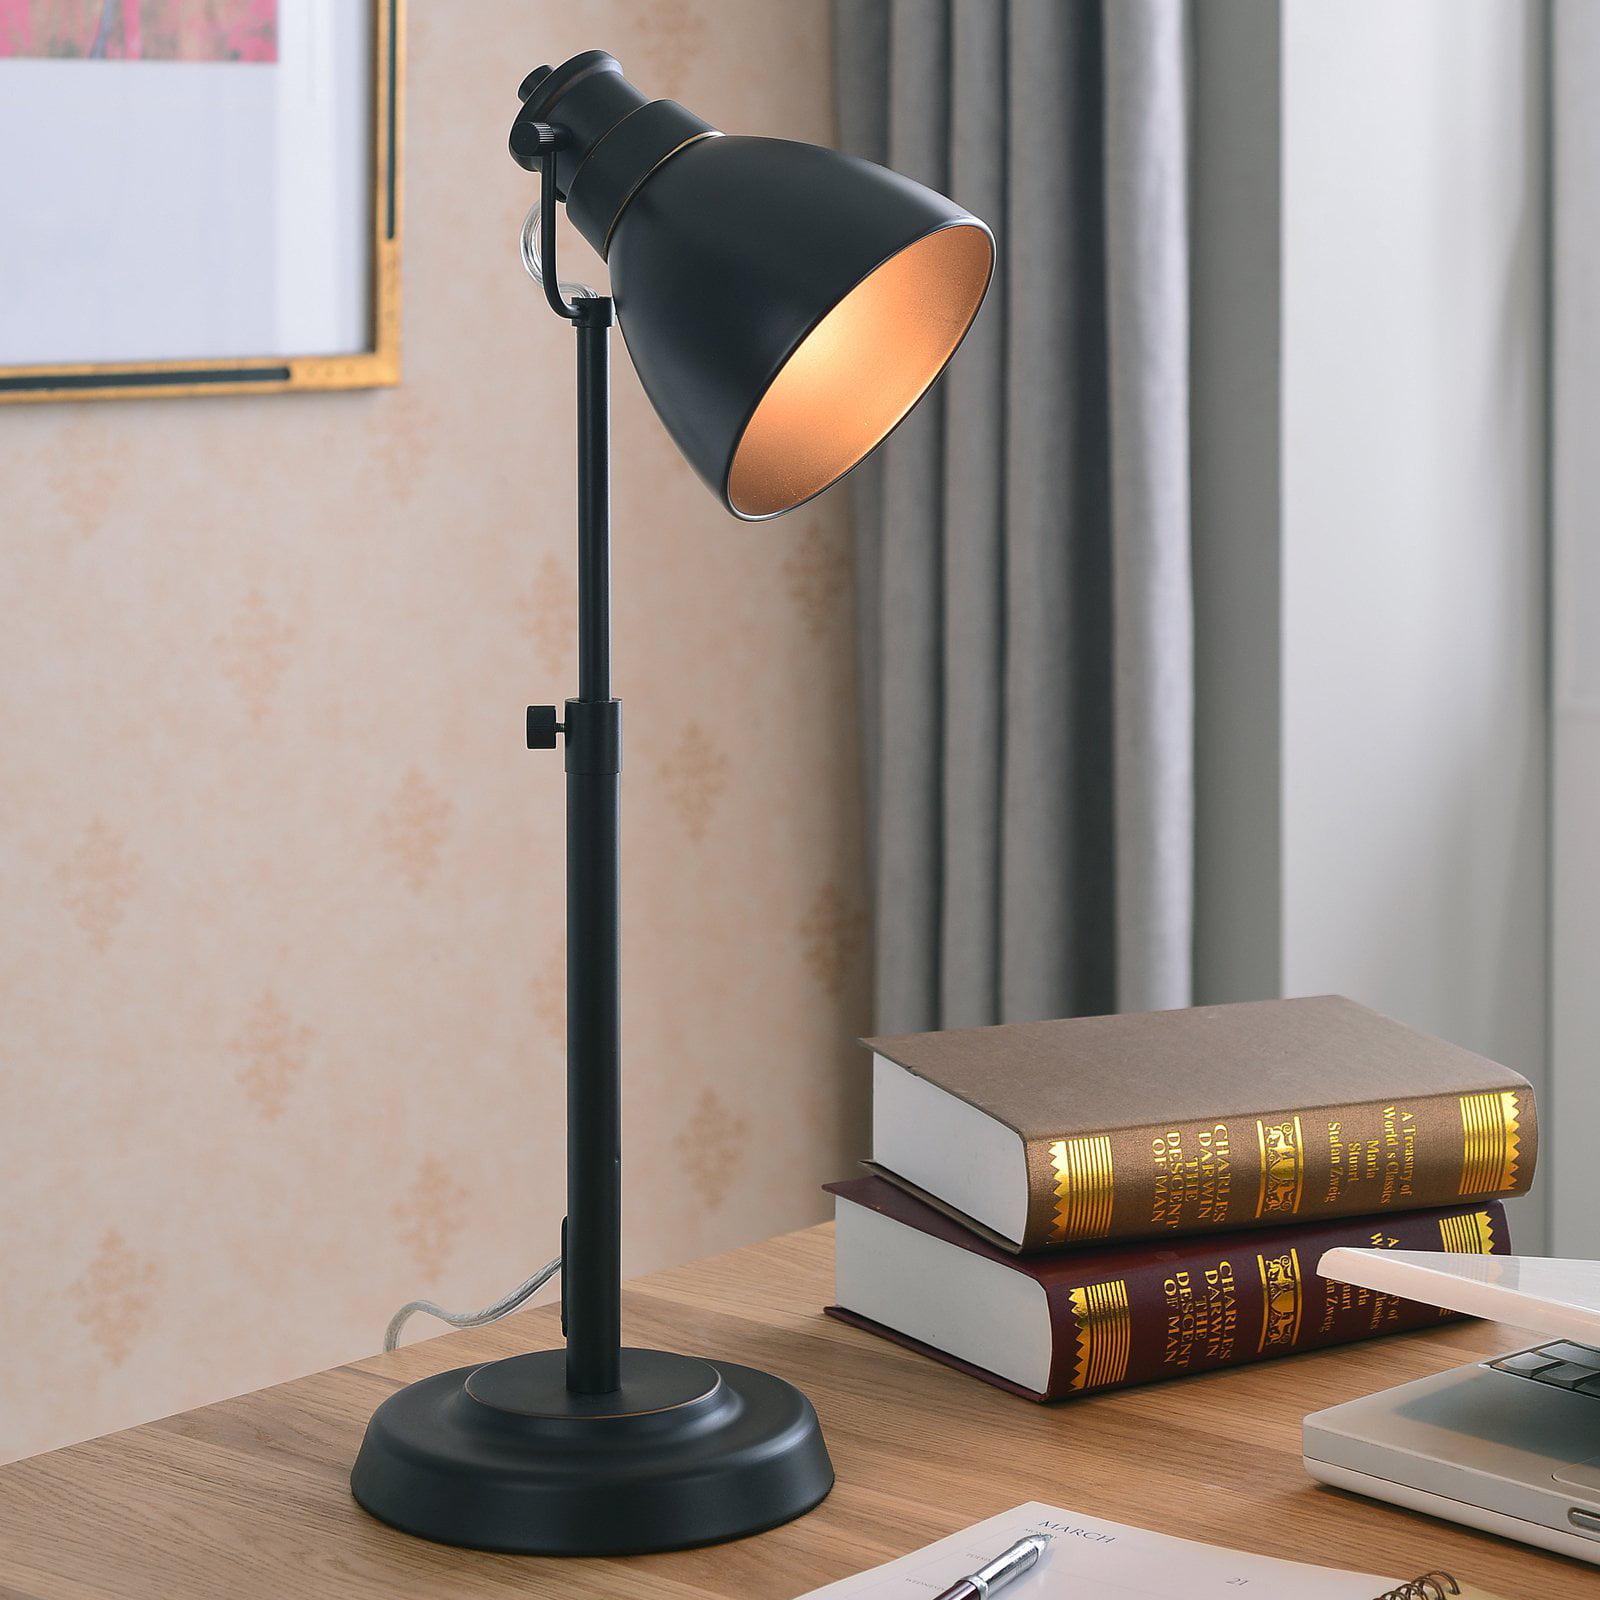 Kenroy Home Polk Oil Rubbed Bronze Desk Lamp by Kenroy Home